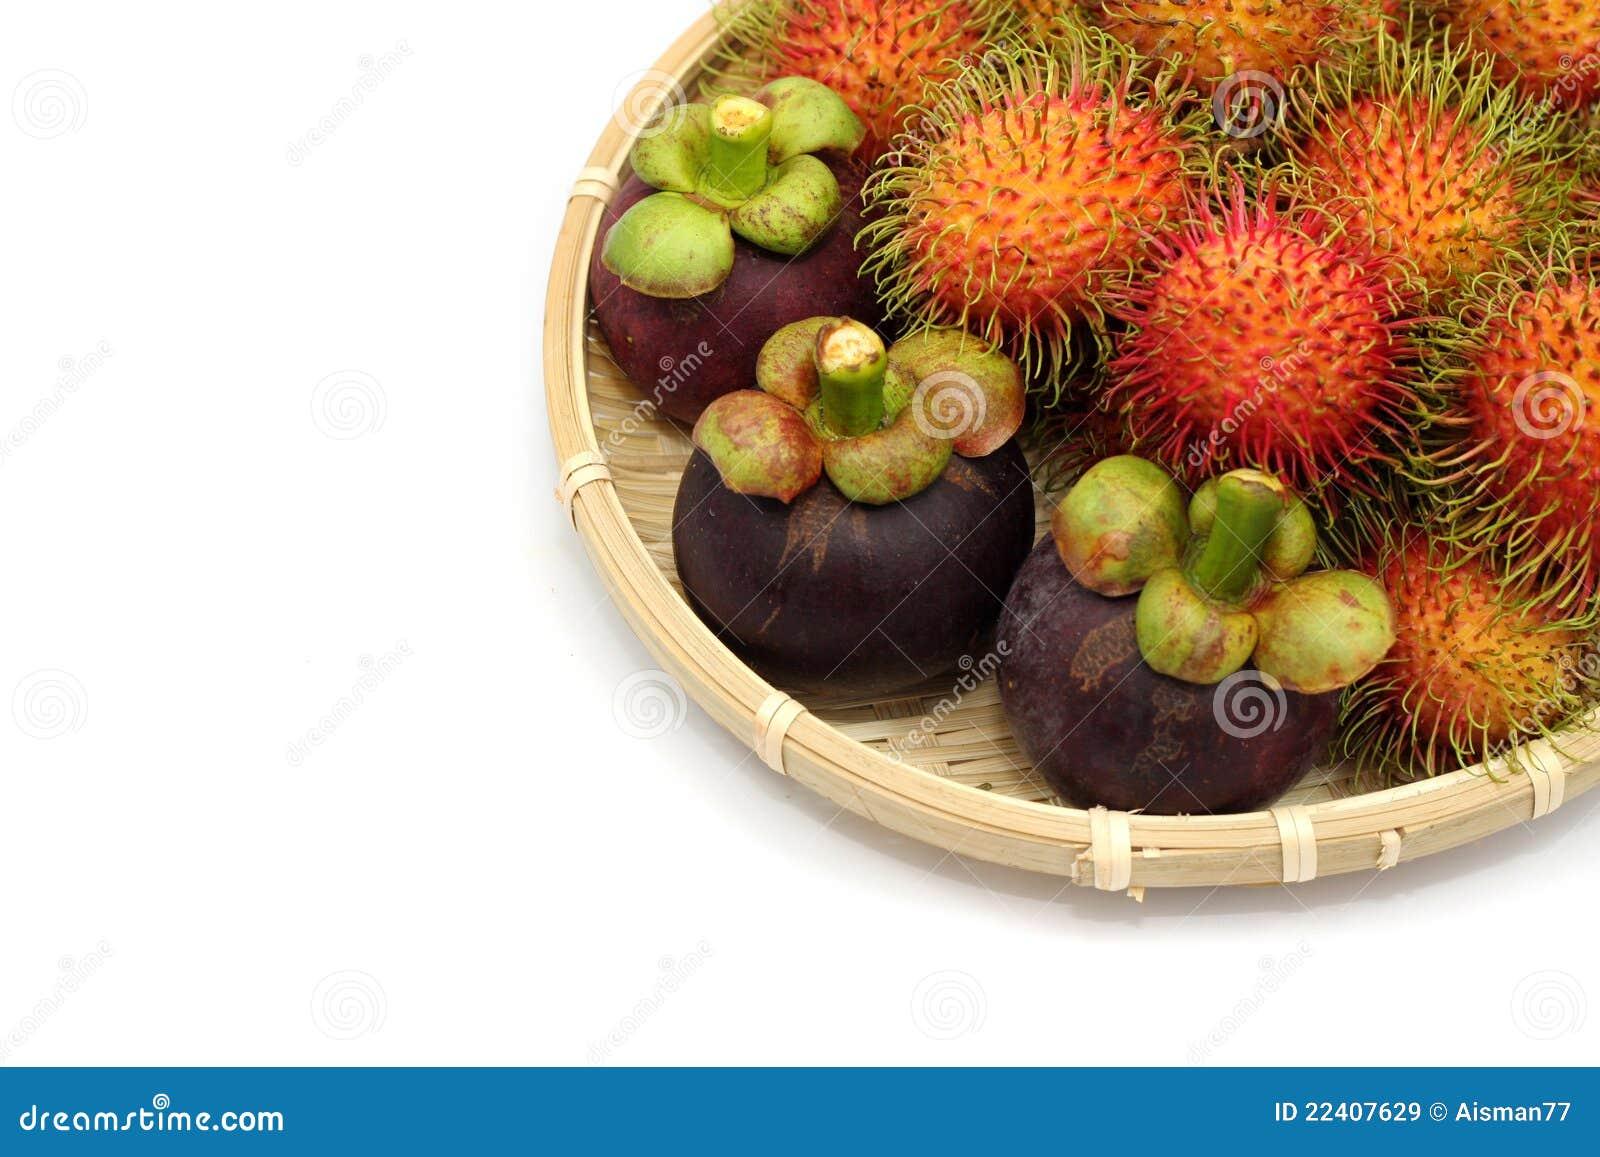 fruits basket season 2 juicy fruit strain